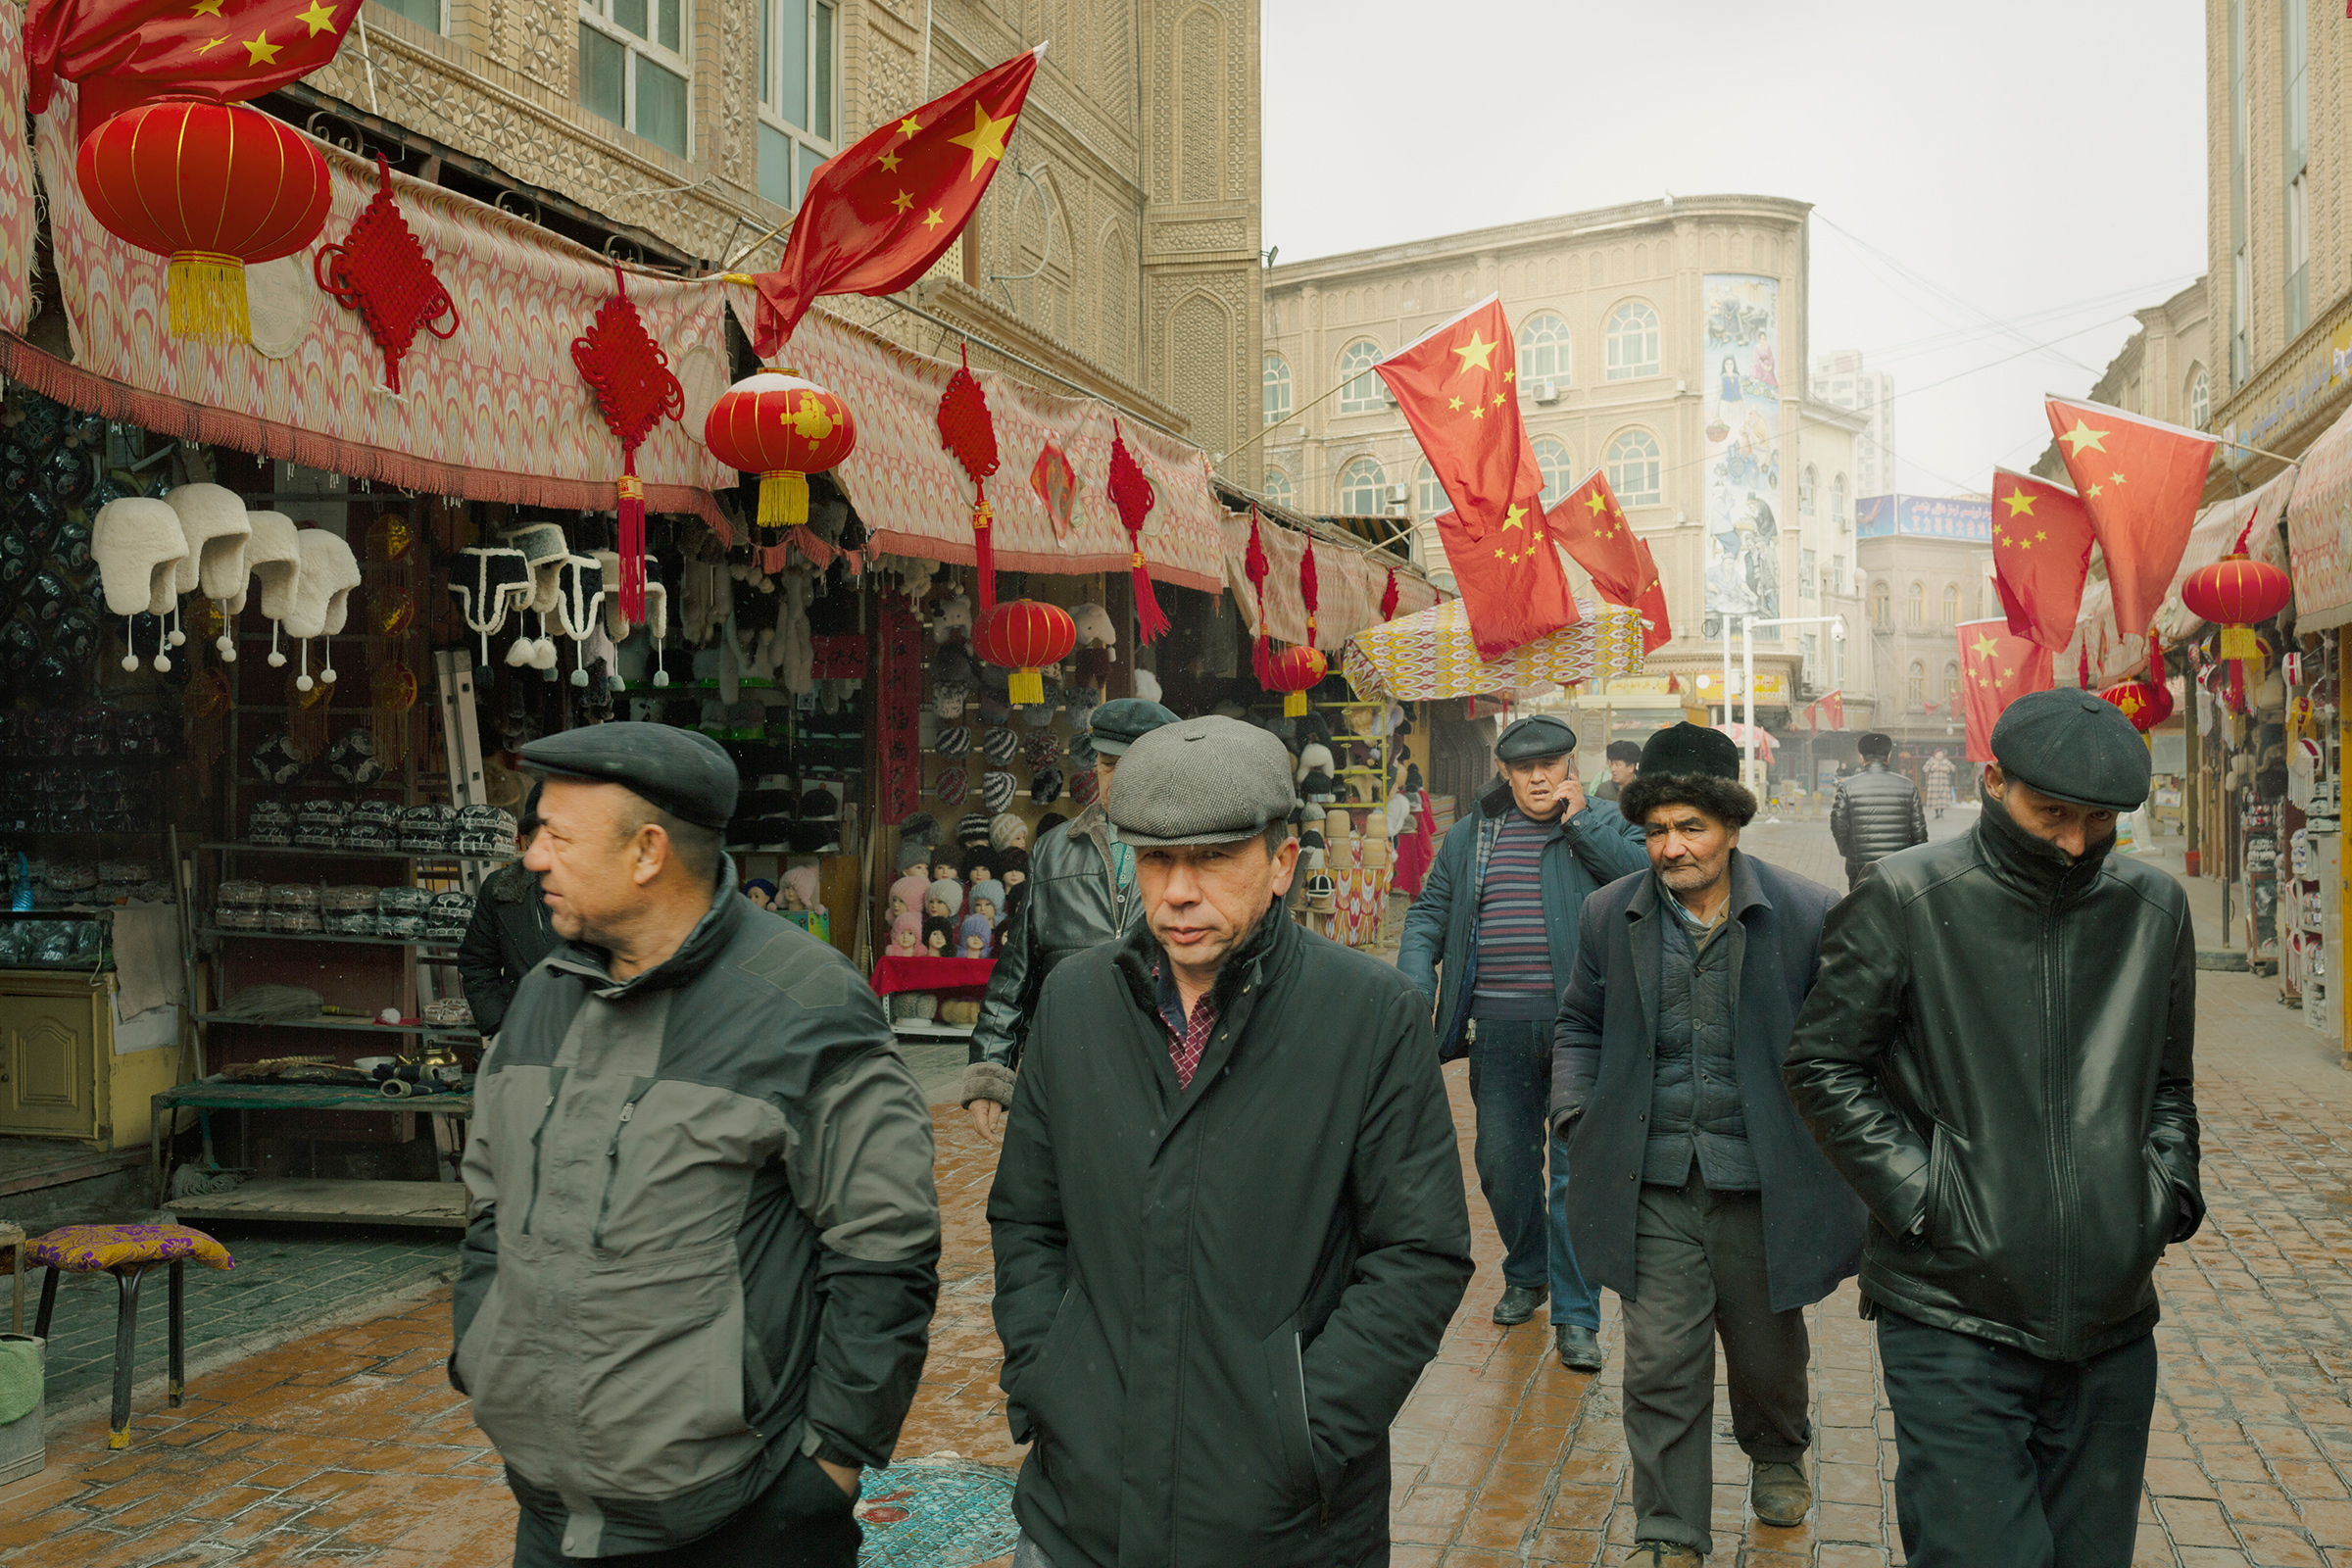 Uighur men strolling through Kashgar, Xinjiang, in January 2019